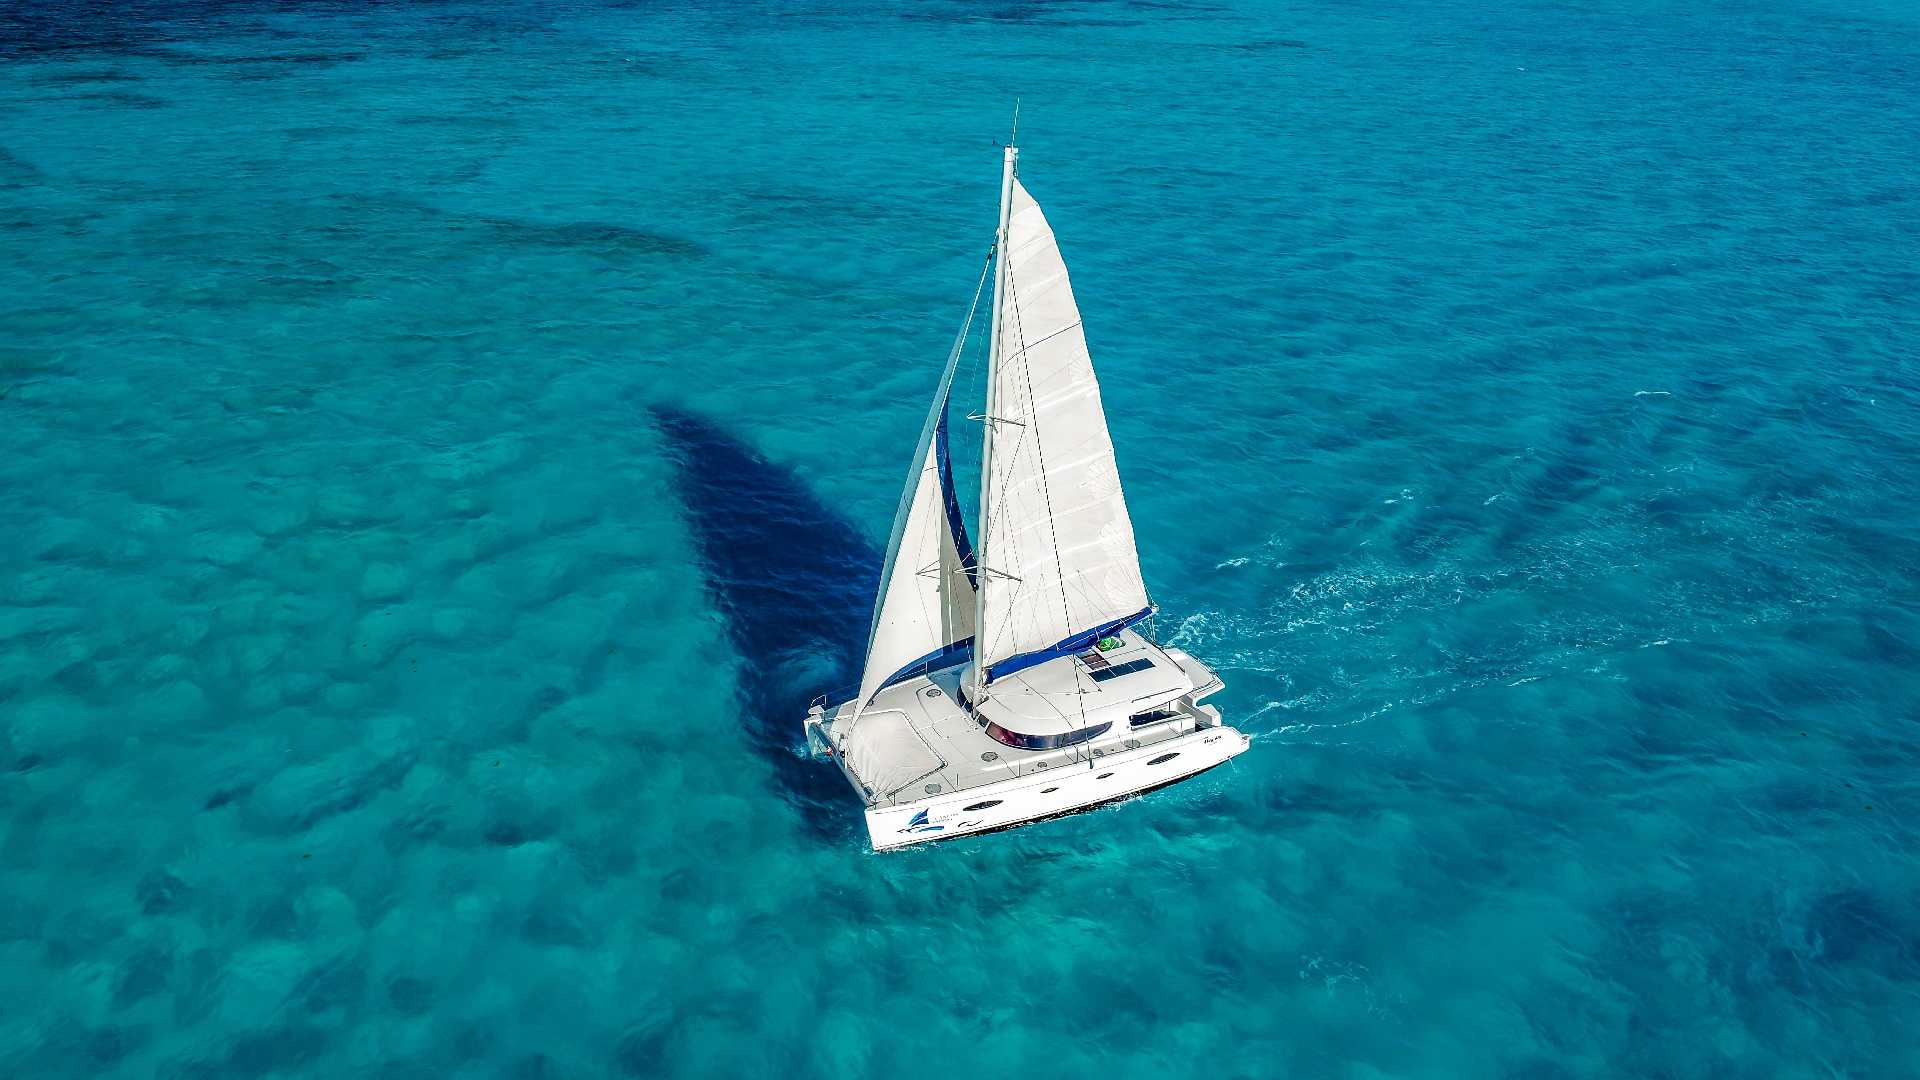 Megaira- Private tour to Isla Mujeres in catamaran - Cancun Sailing